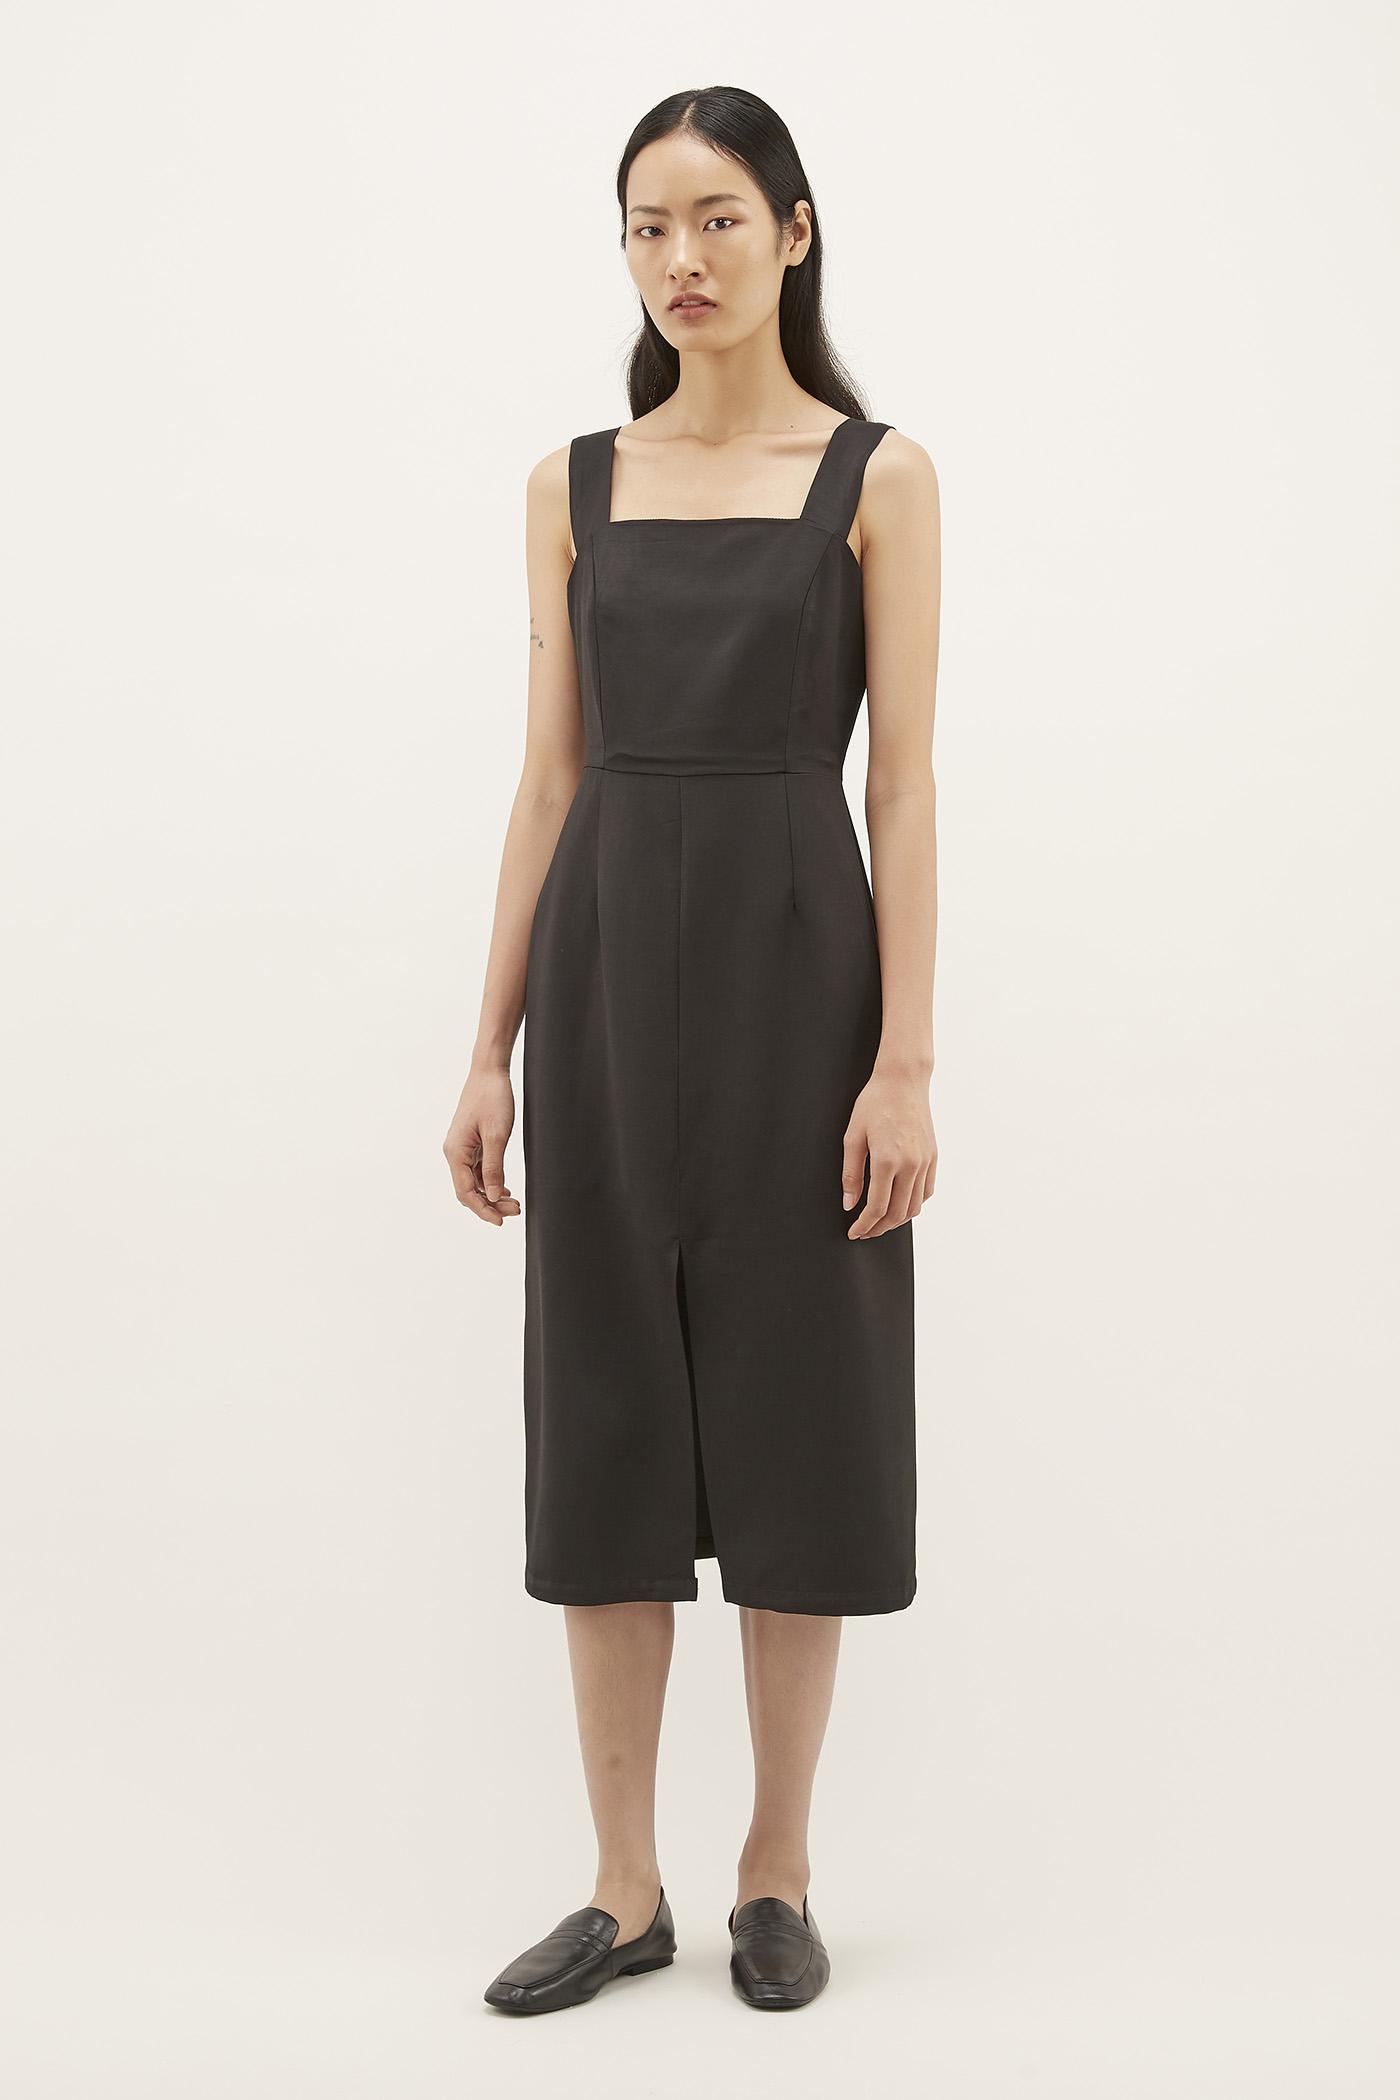 Morlana Square-neck Dress